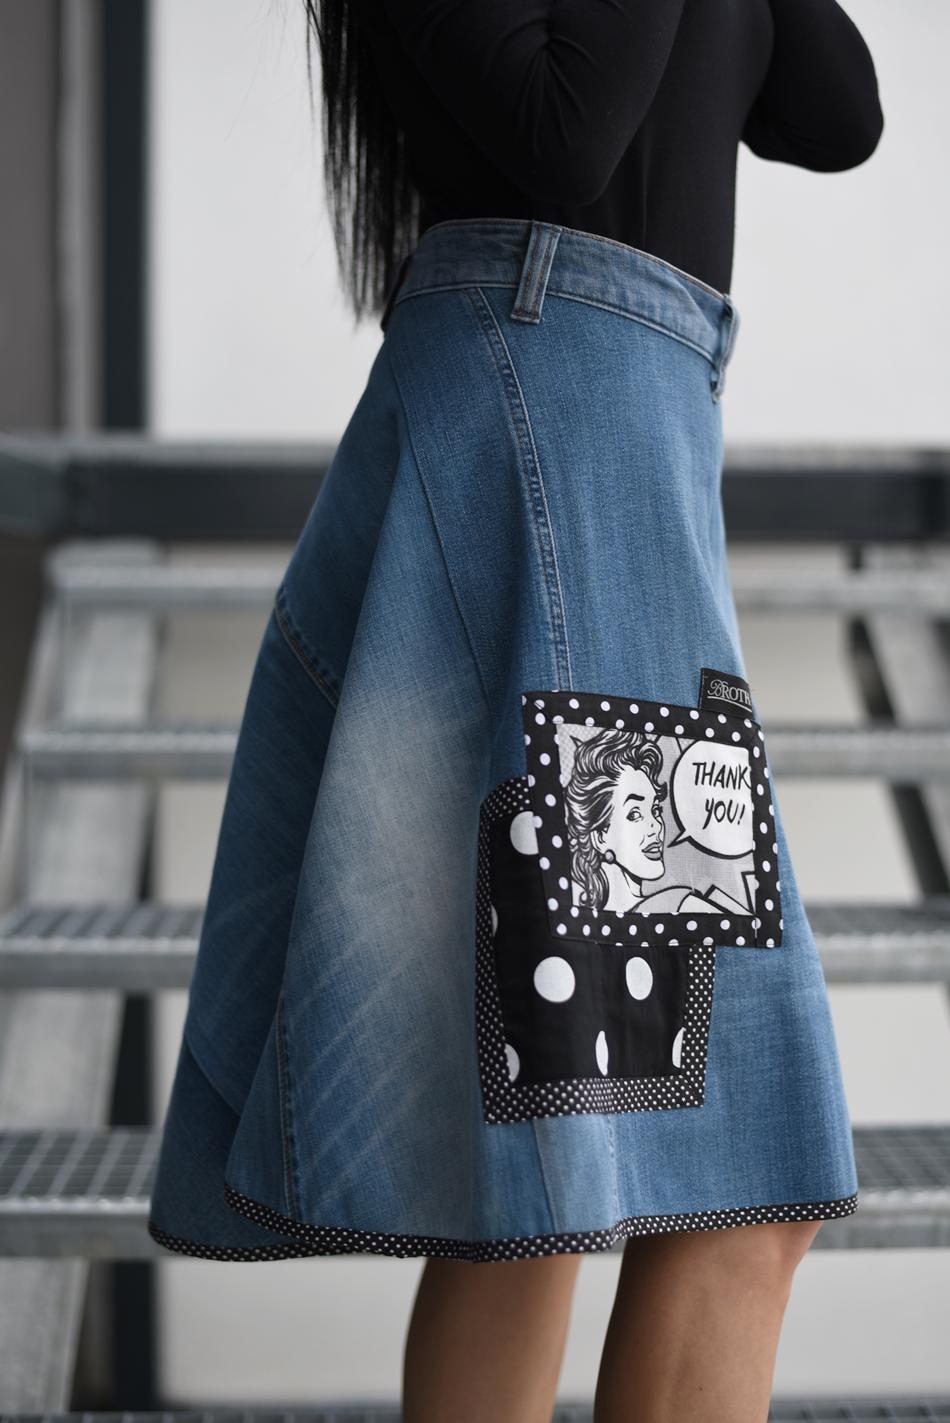 Broth_design_clothes_069